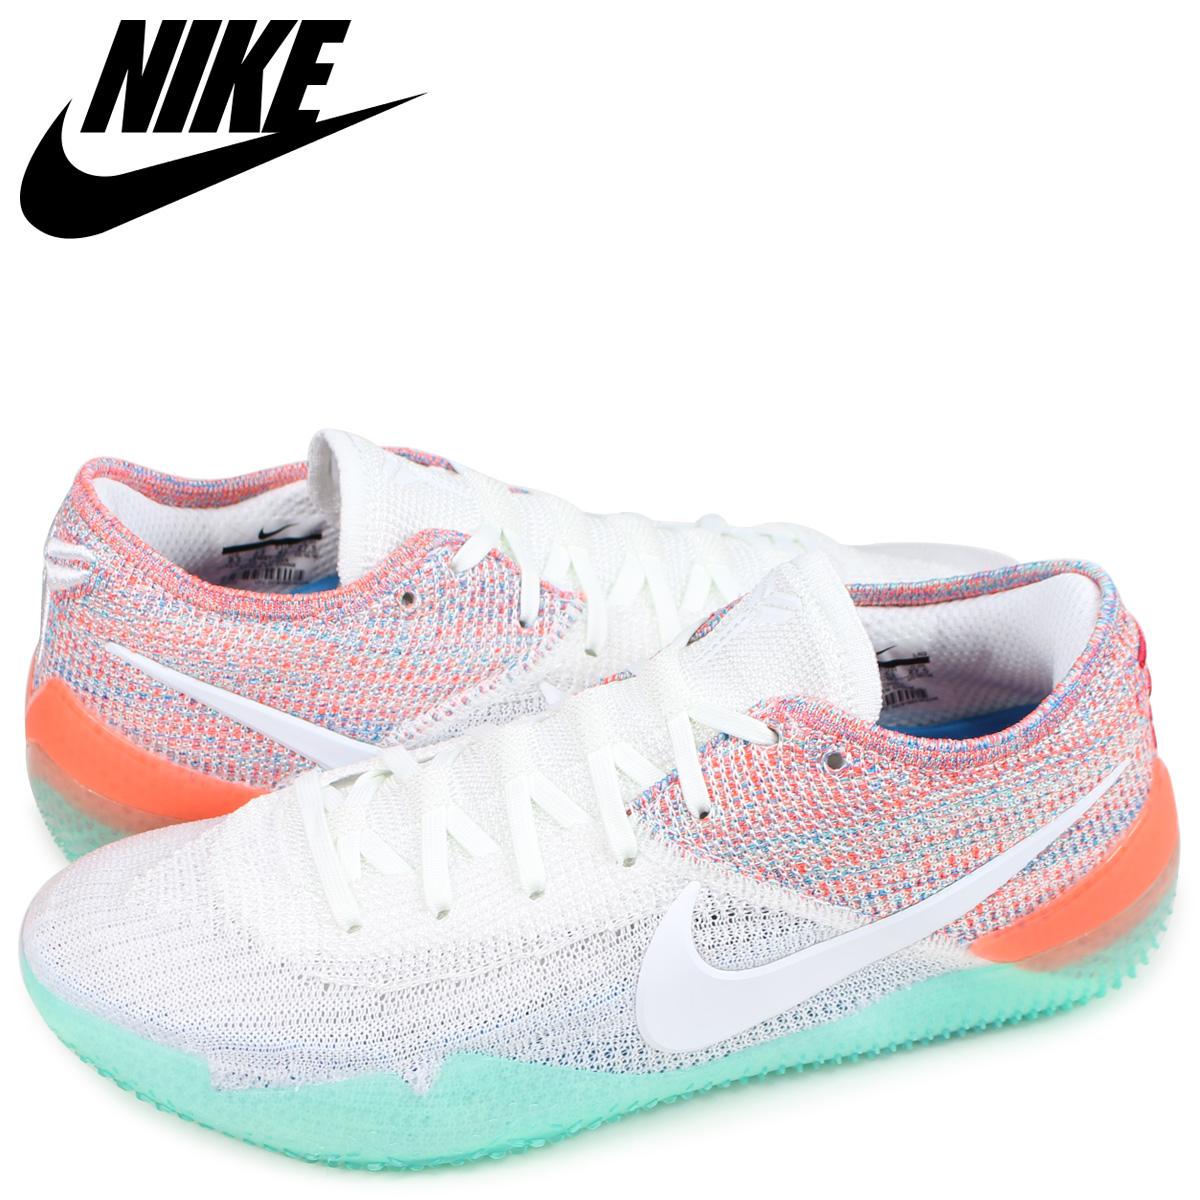 5665beb889b0 Whats up Sports  NIKE KOBE AD NXT 360 Nike Corby sneakers men AQ1087 ...